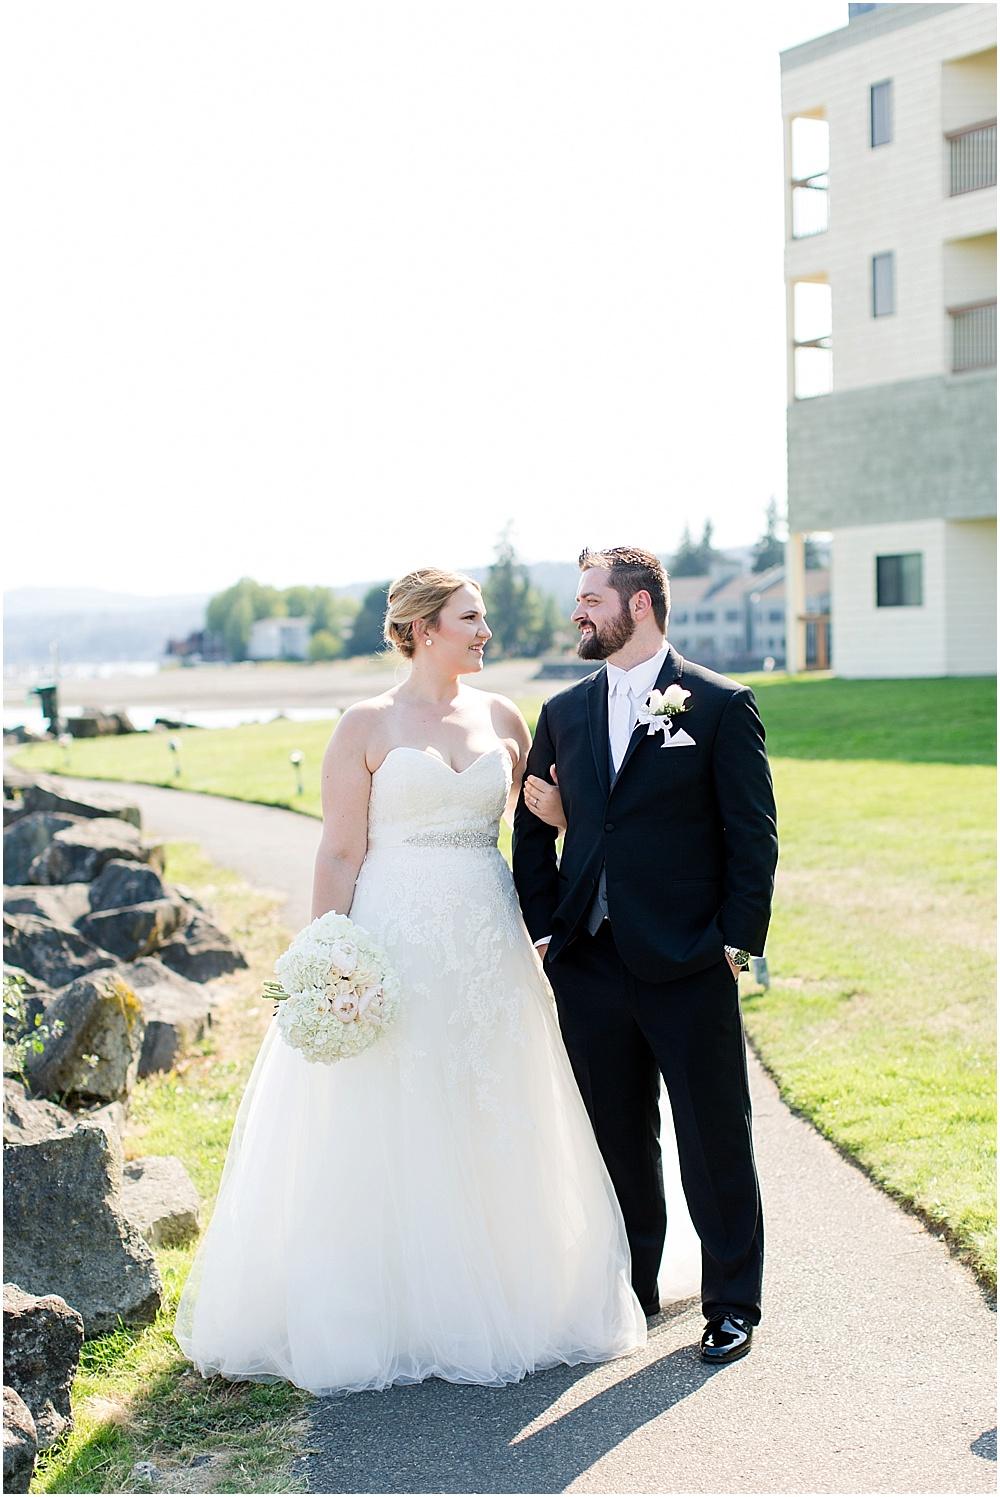 mitzner_silverdale_beach_hotel_wedding_silverdale_washington_pacific_northwest_wedding_photographer_0027